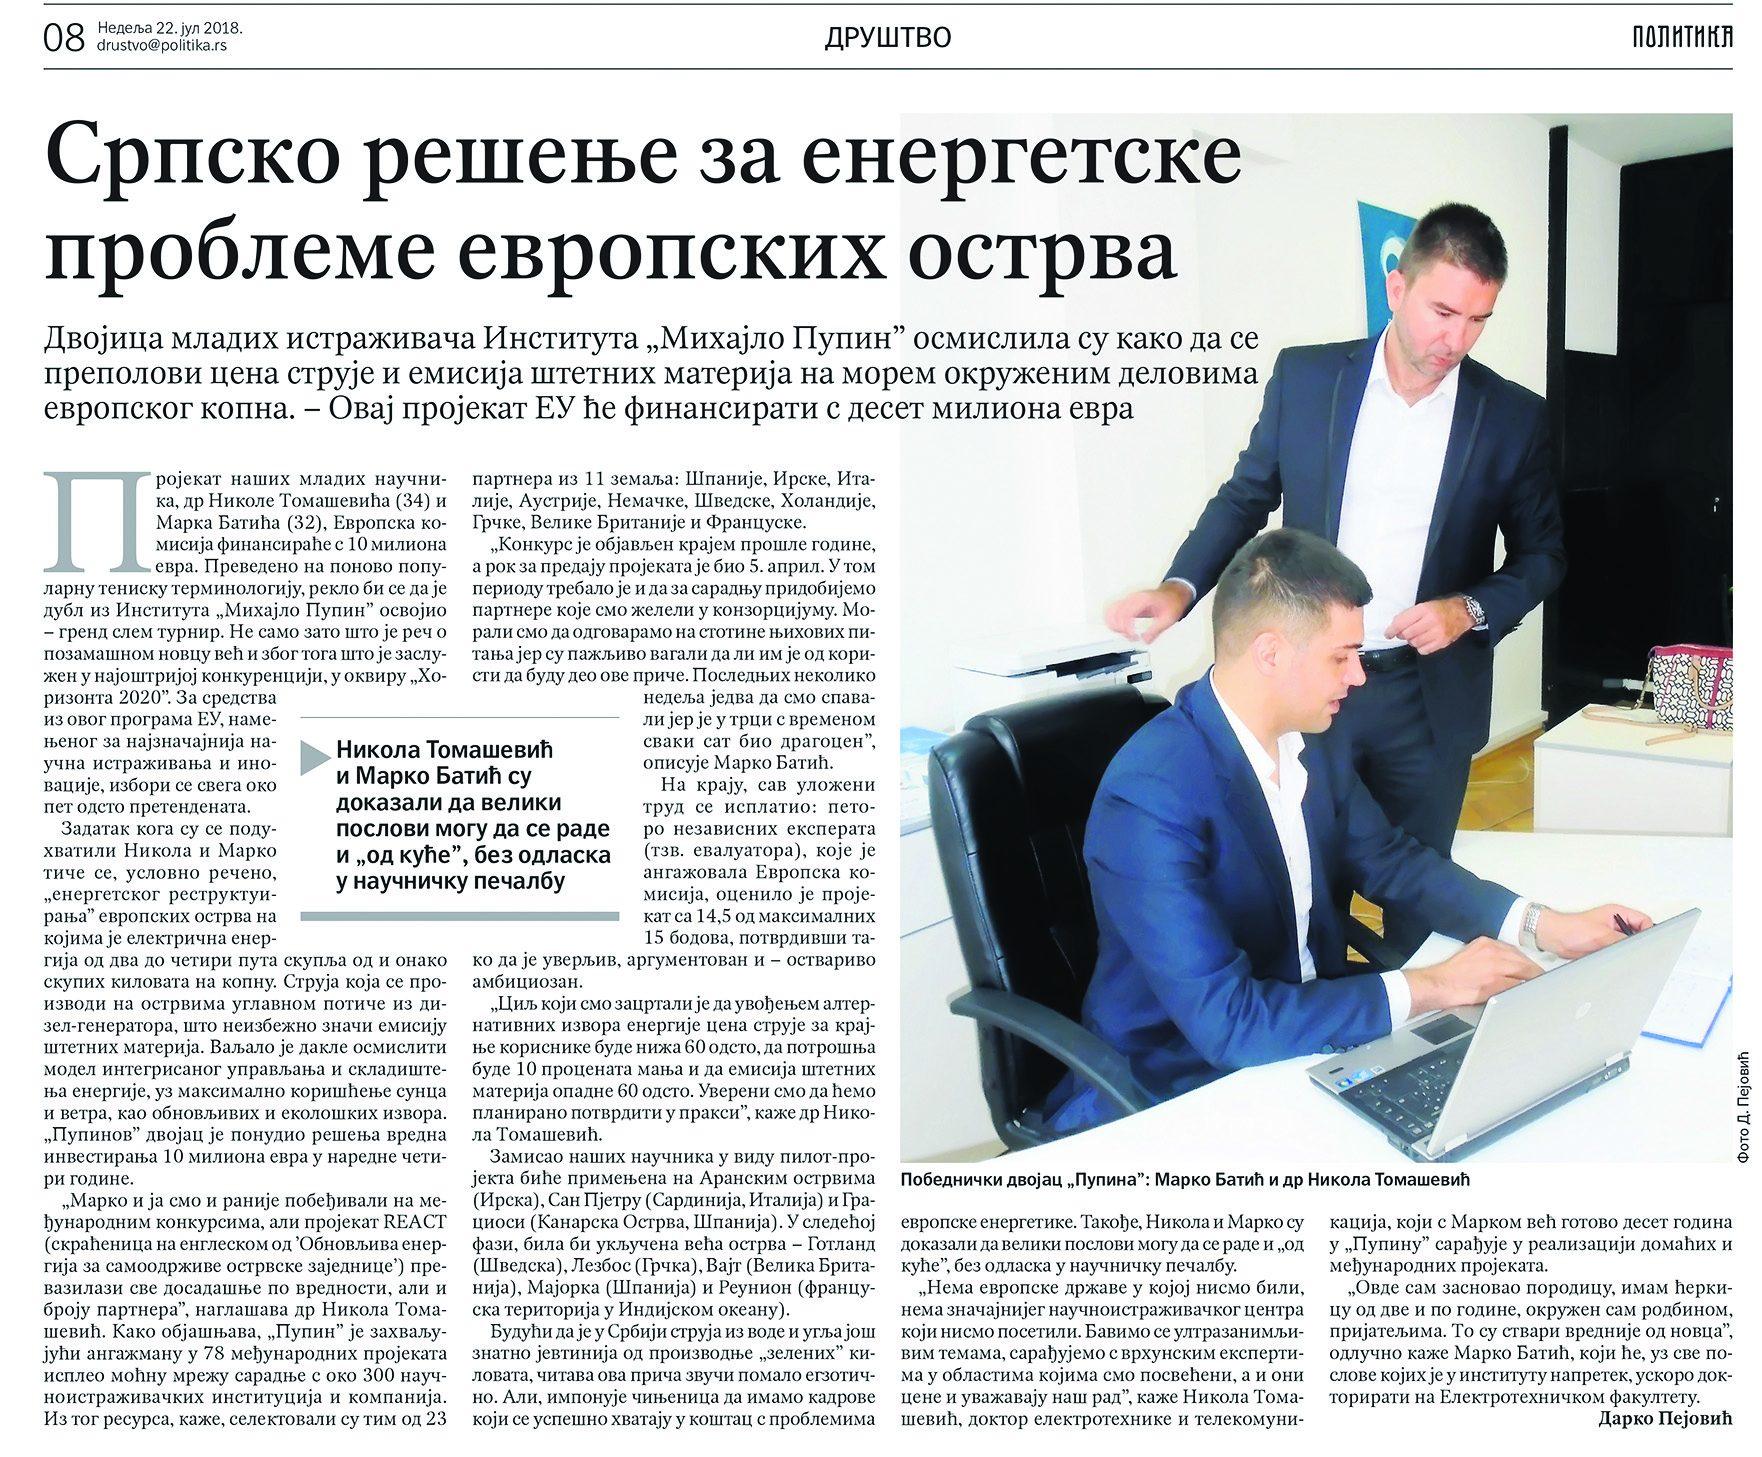 politika-8-strana-22-jul-2018a-1241680